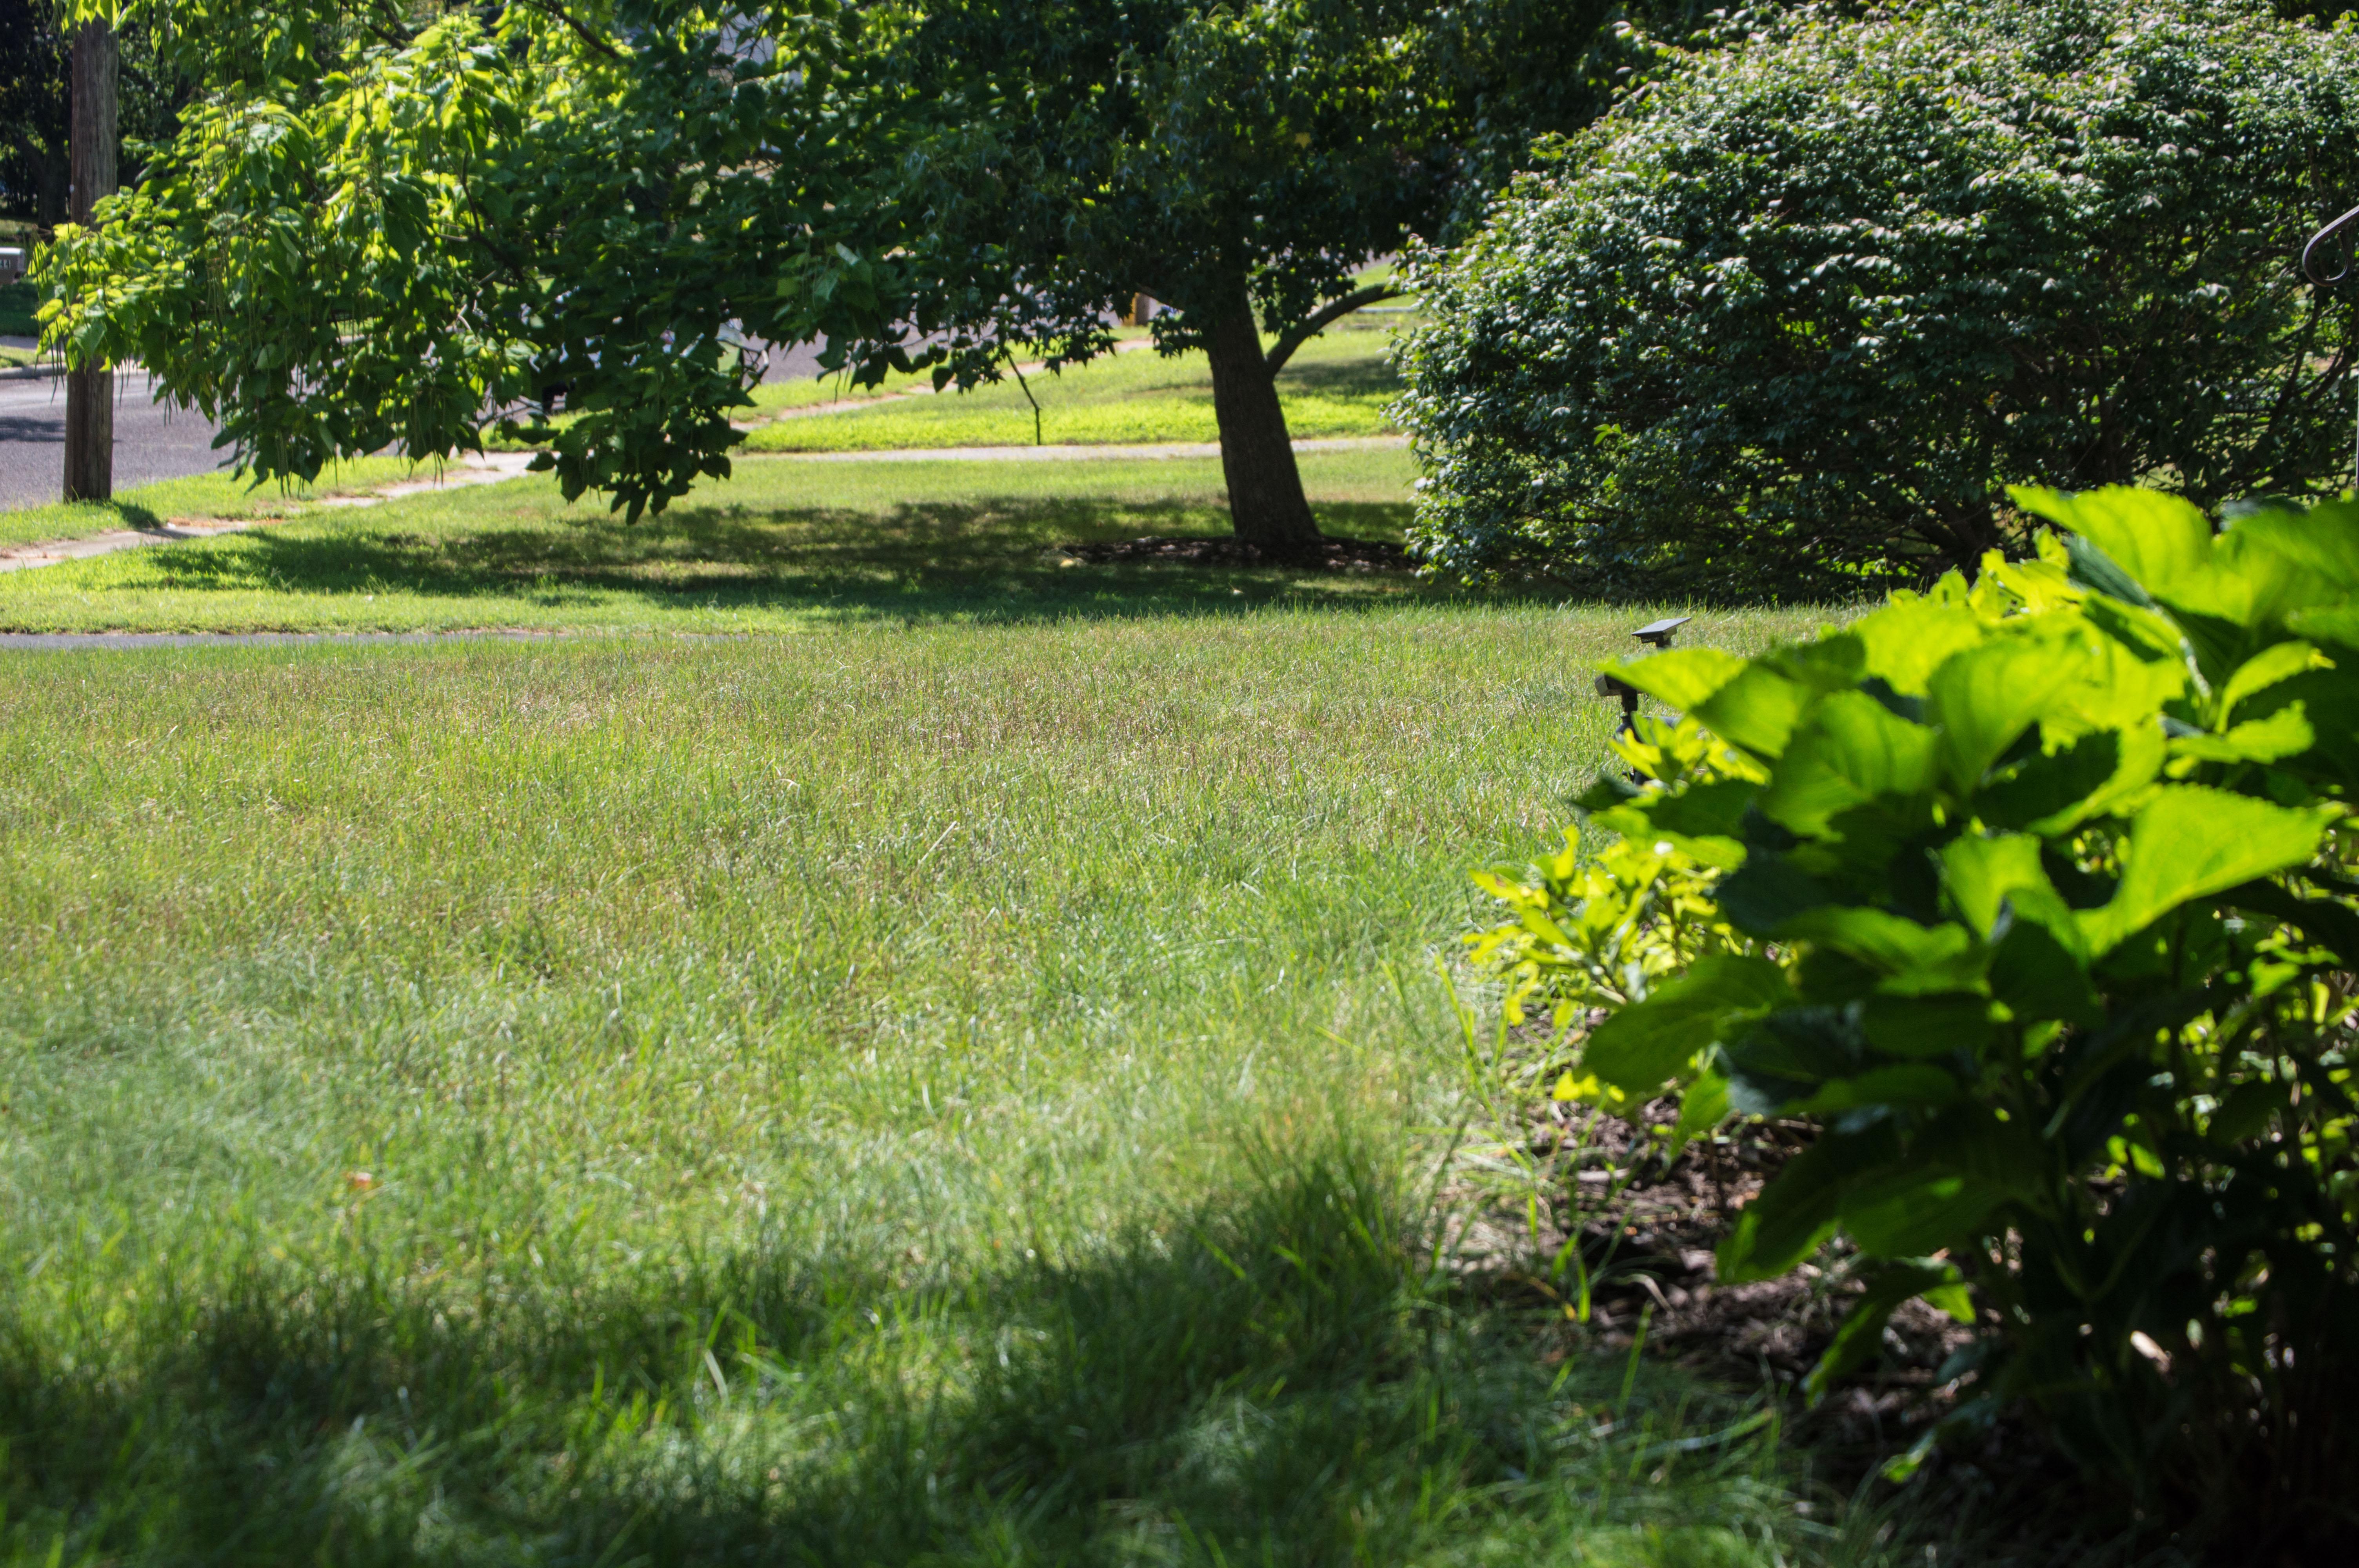 A lawn in Brick Township bakes in the summer sun. (Photo: Daniel Nee)